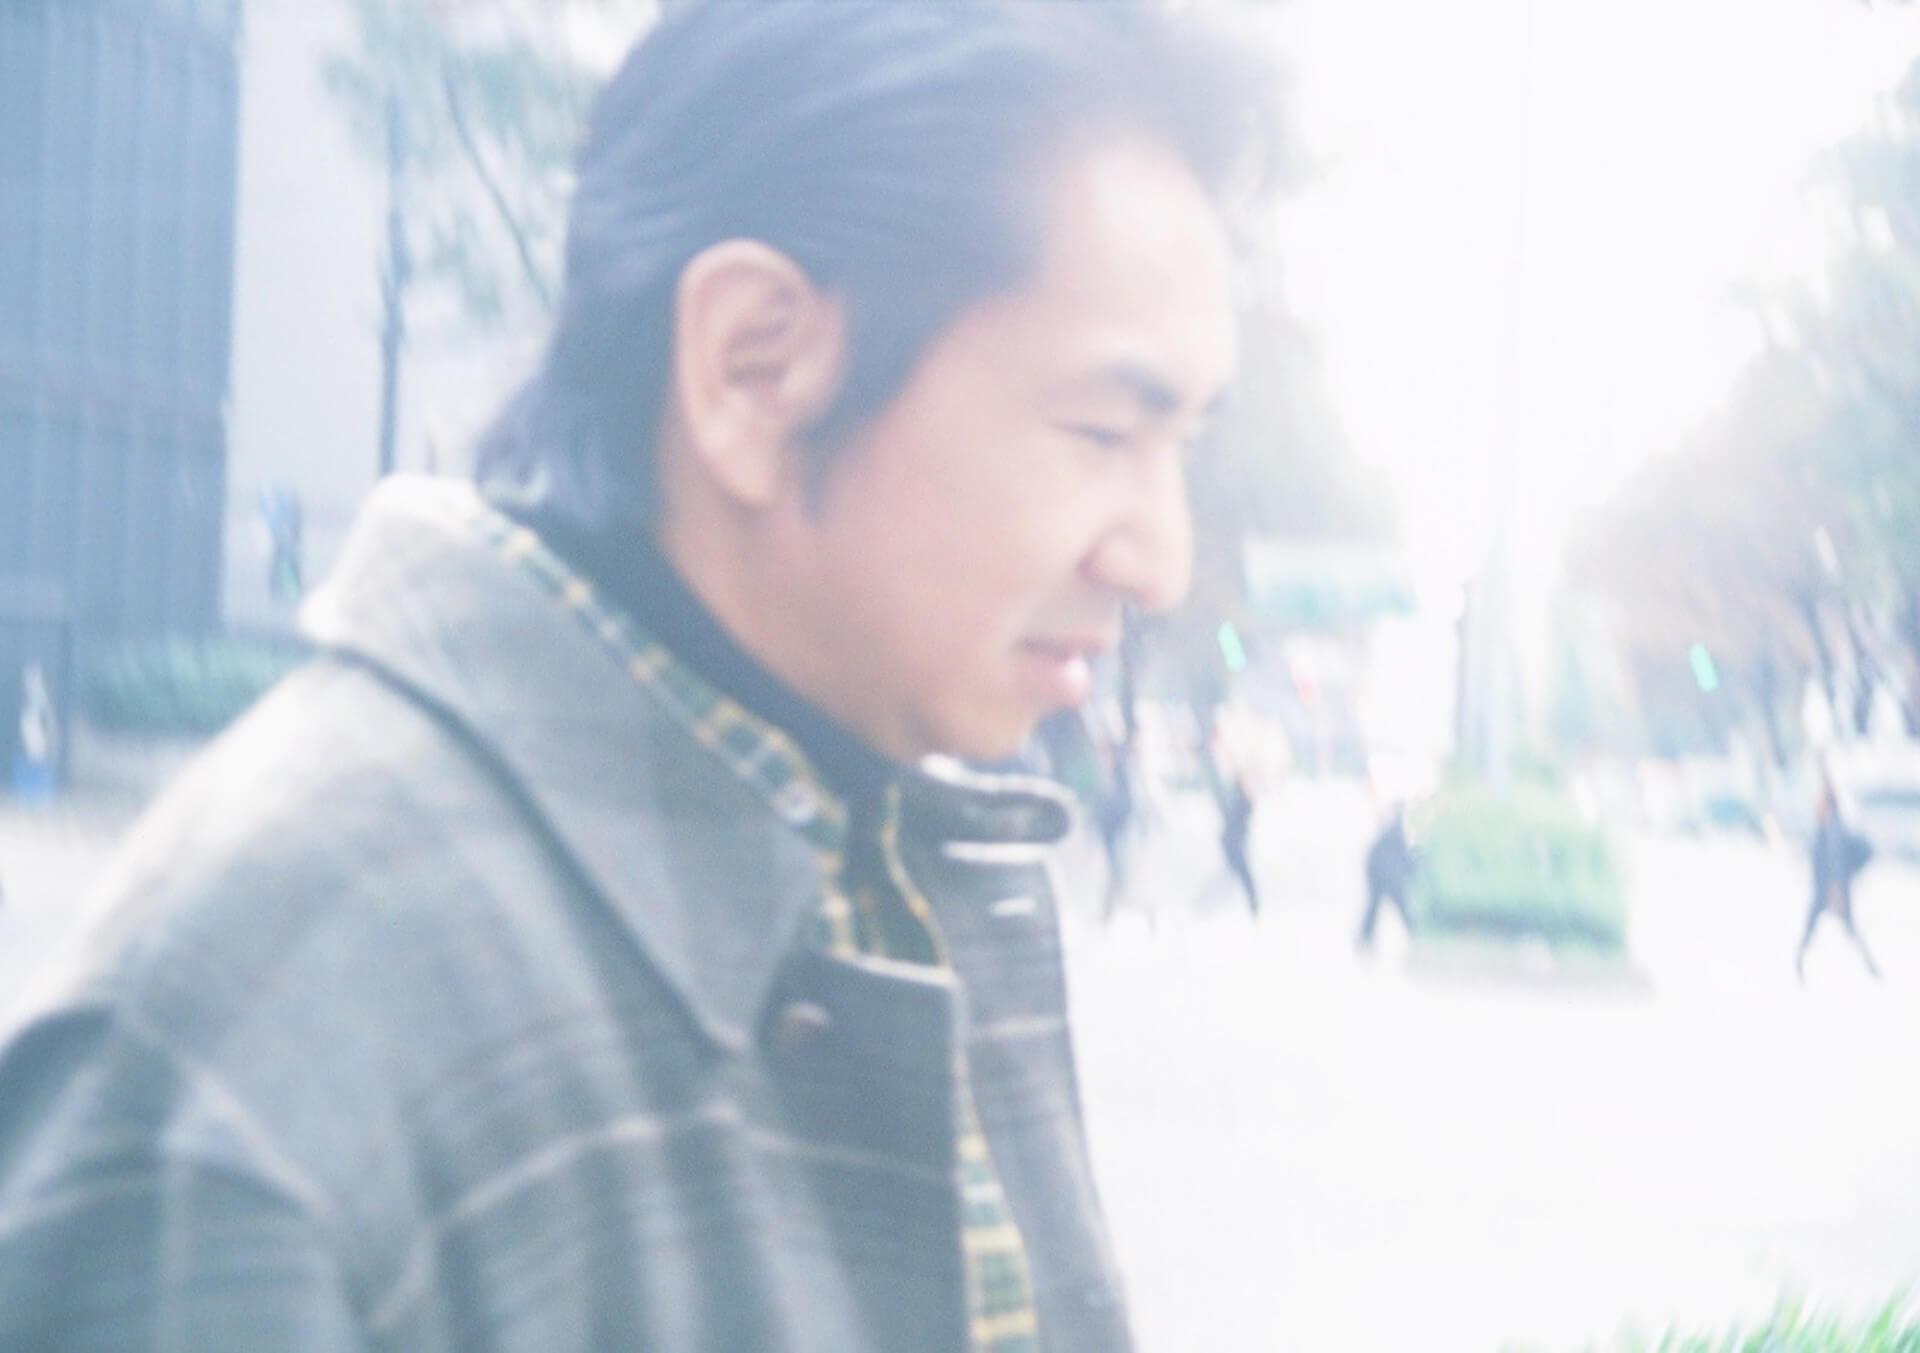 ORIGINAL LOVE、田島貴男自身がカッティング監修した新作『bless You!』のアナログ盤が本日リリース|<フジロック>ではPUNPEE、長岡亮介が飛び入りし話題に music190821-originallove-1